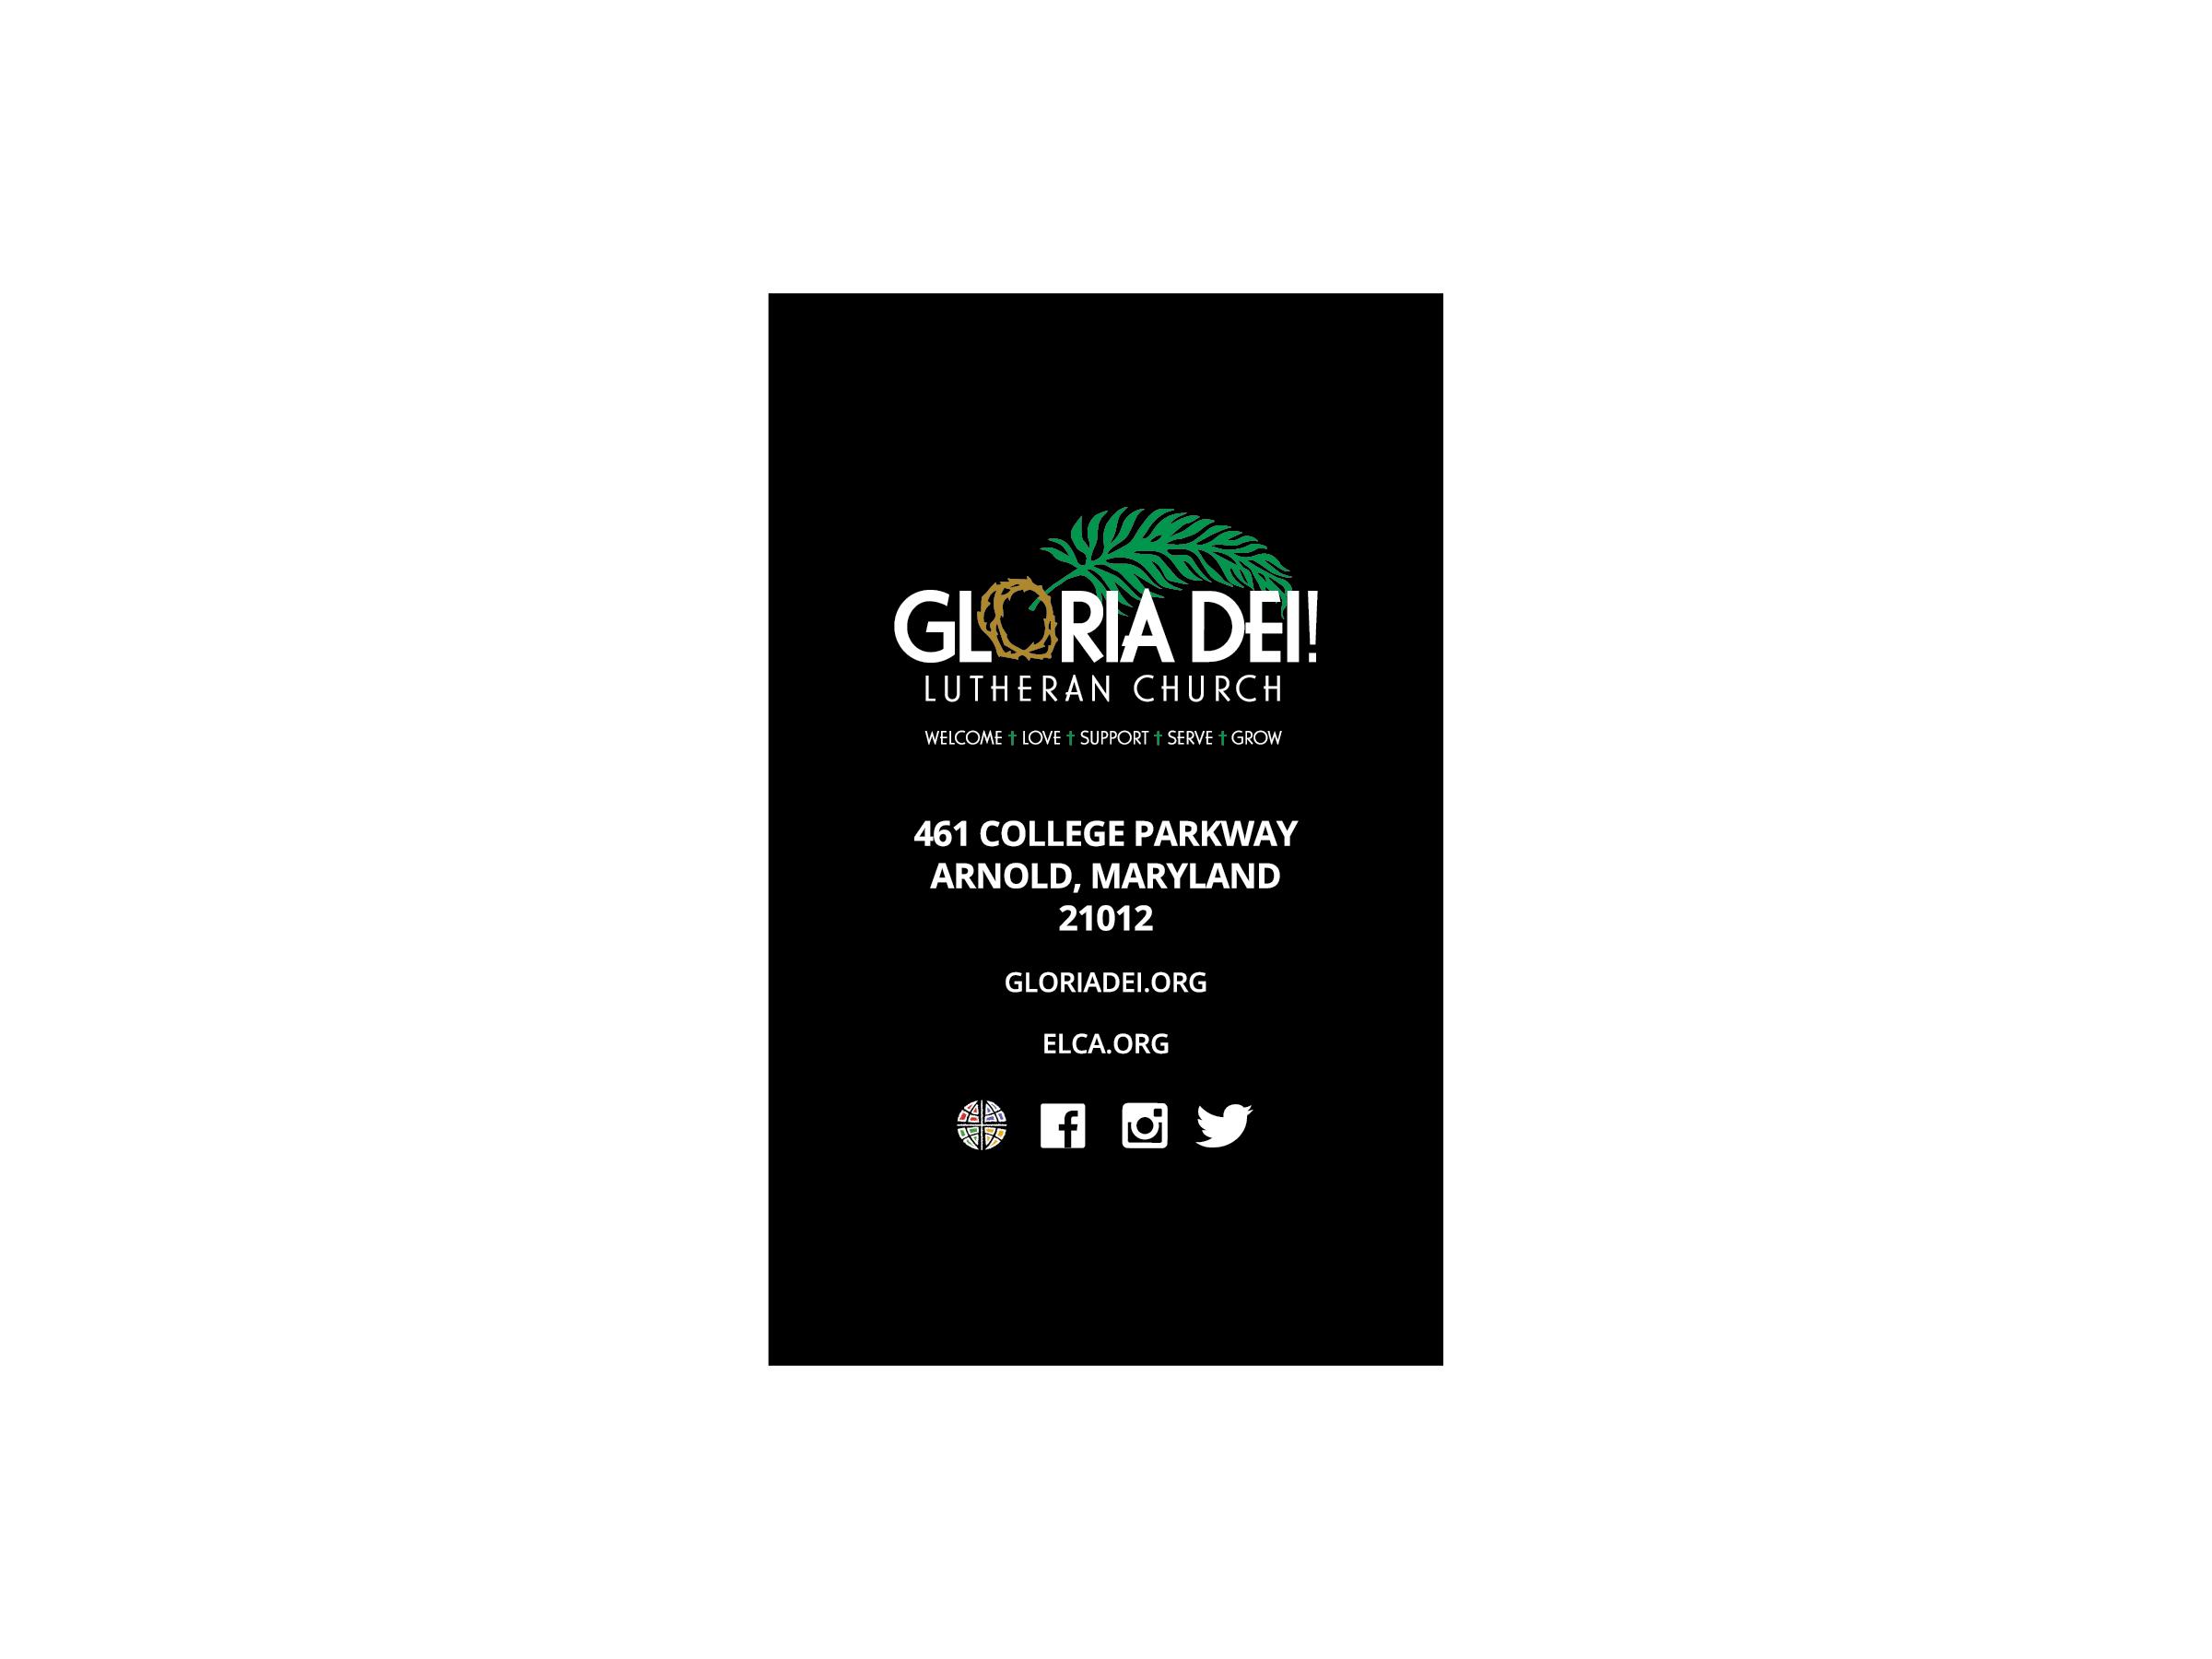 Gloria Dei Business Card Front